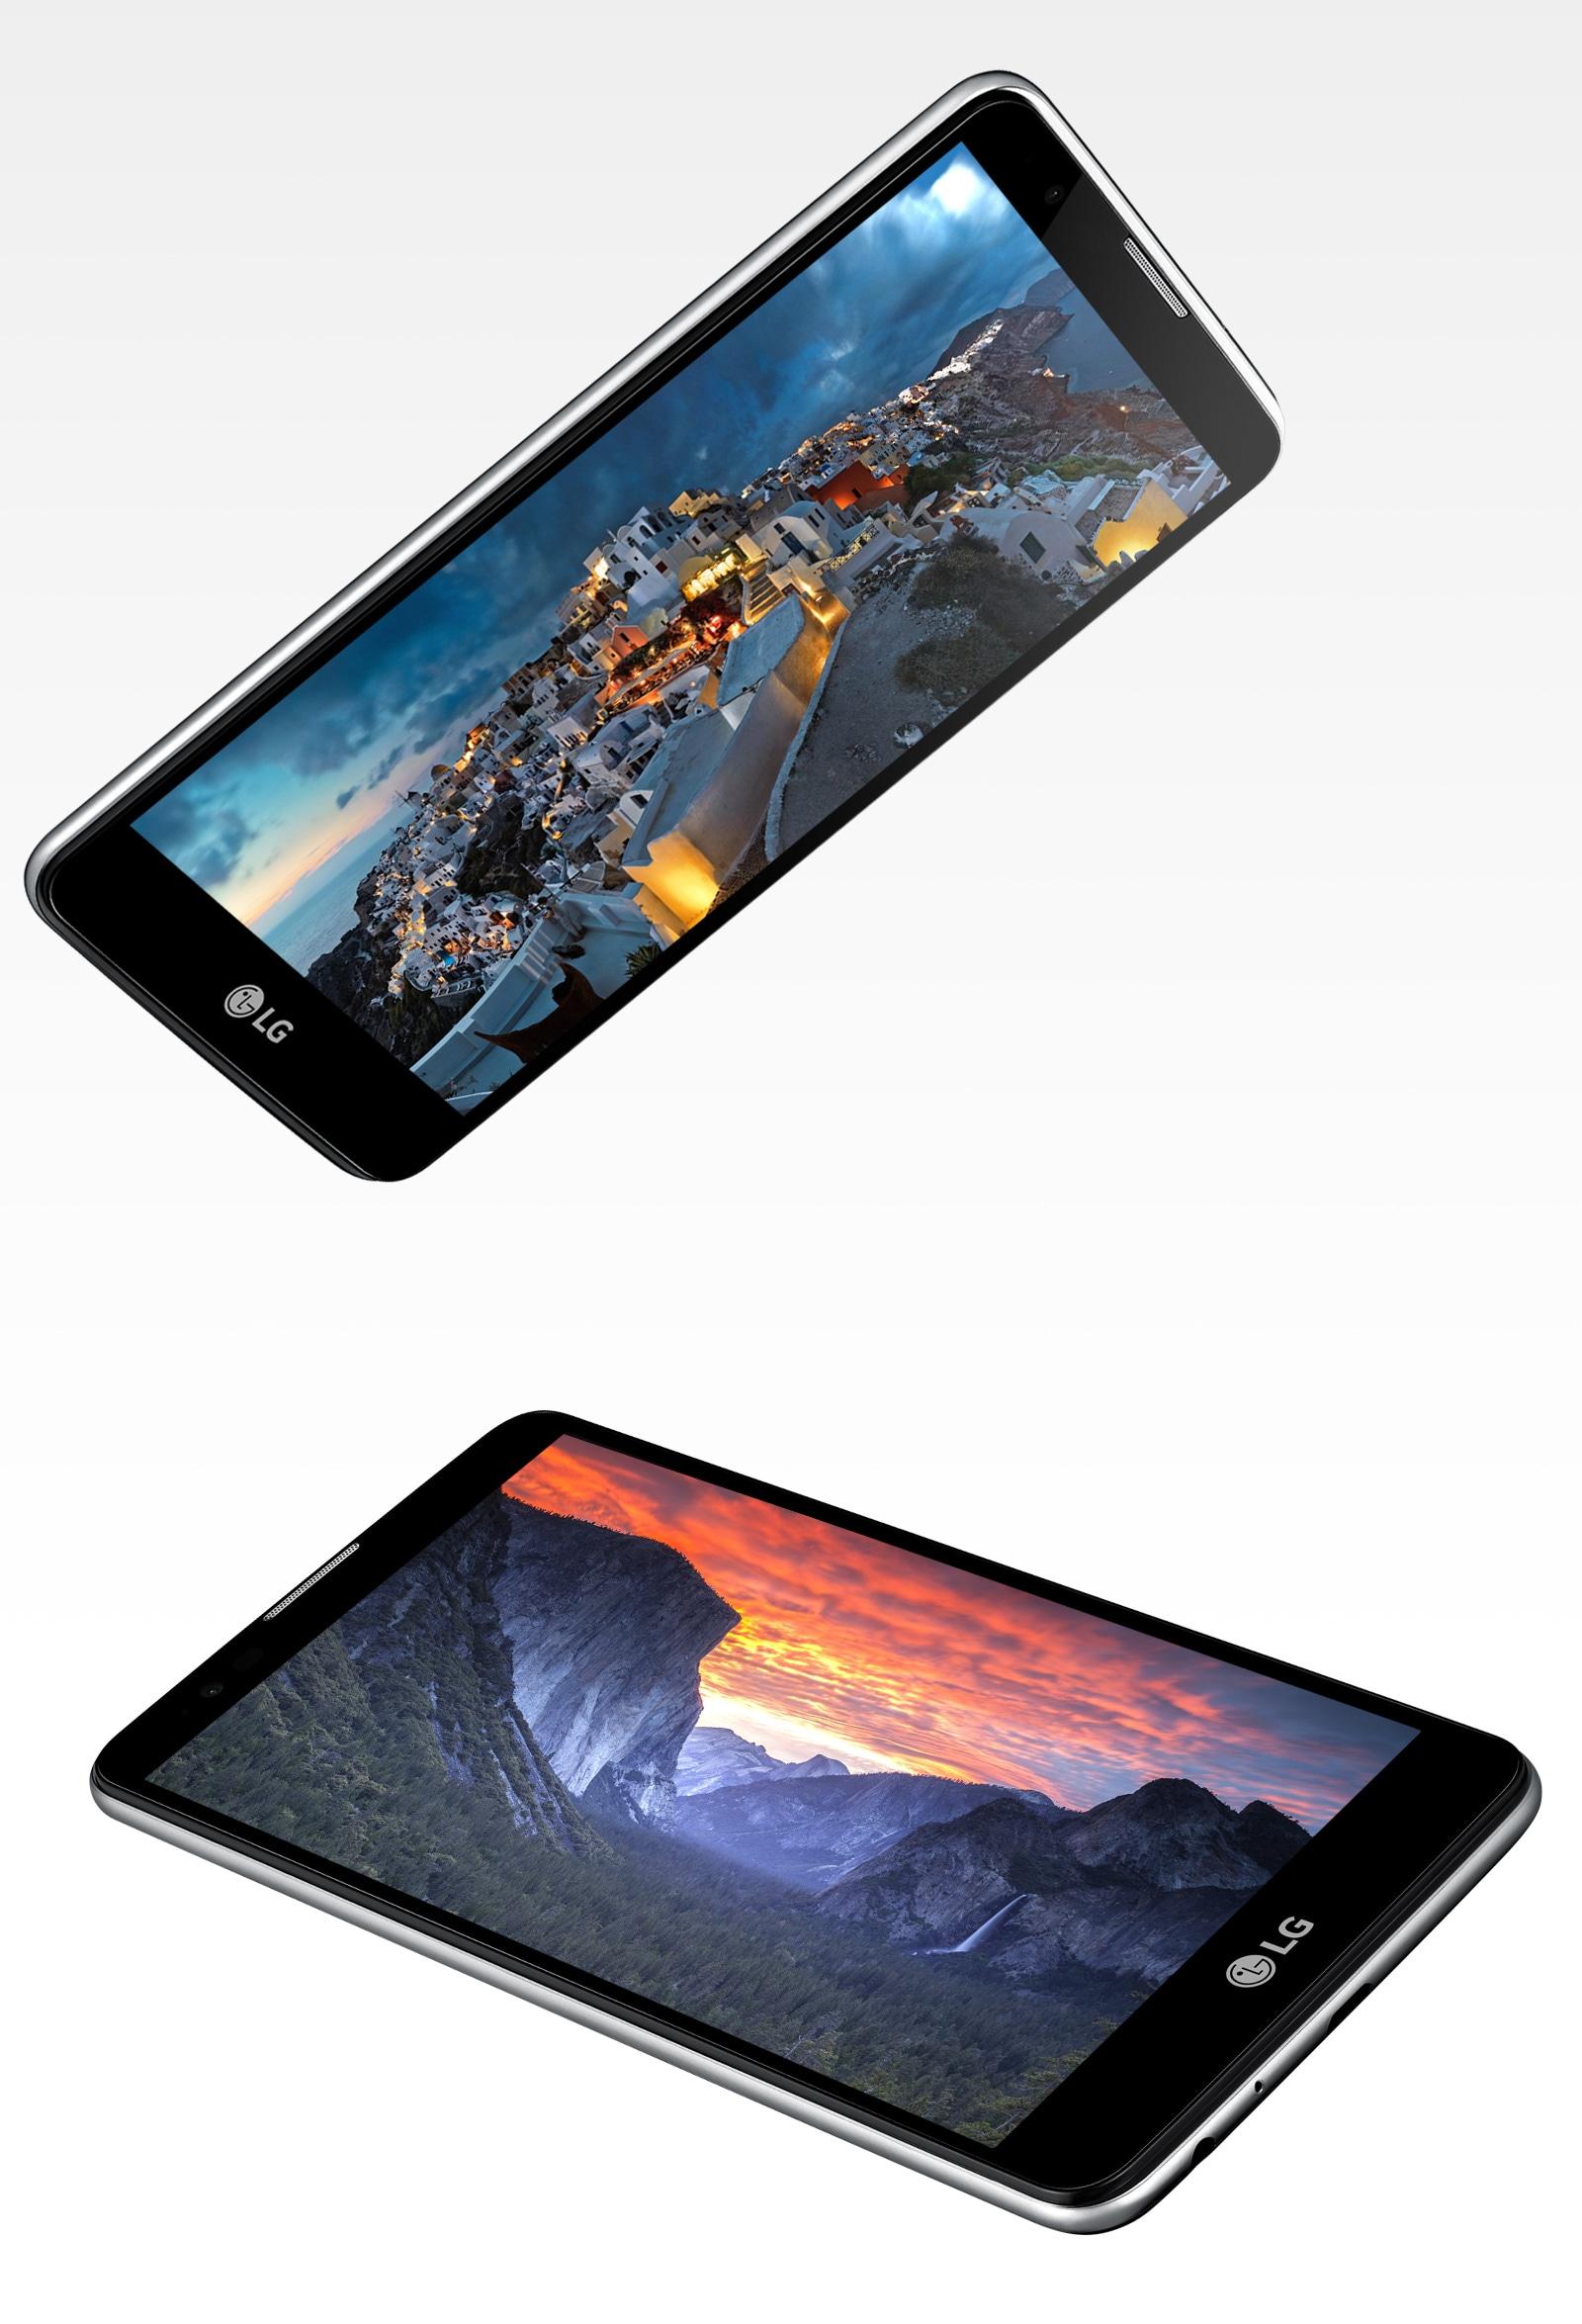 5 7 inch HD Display